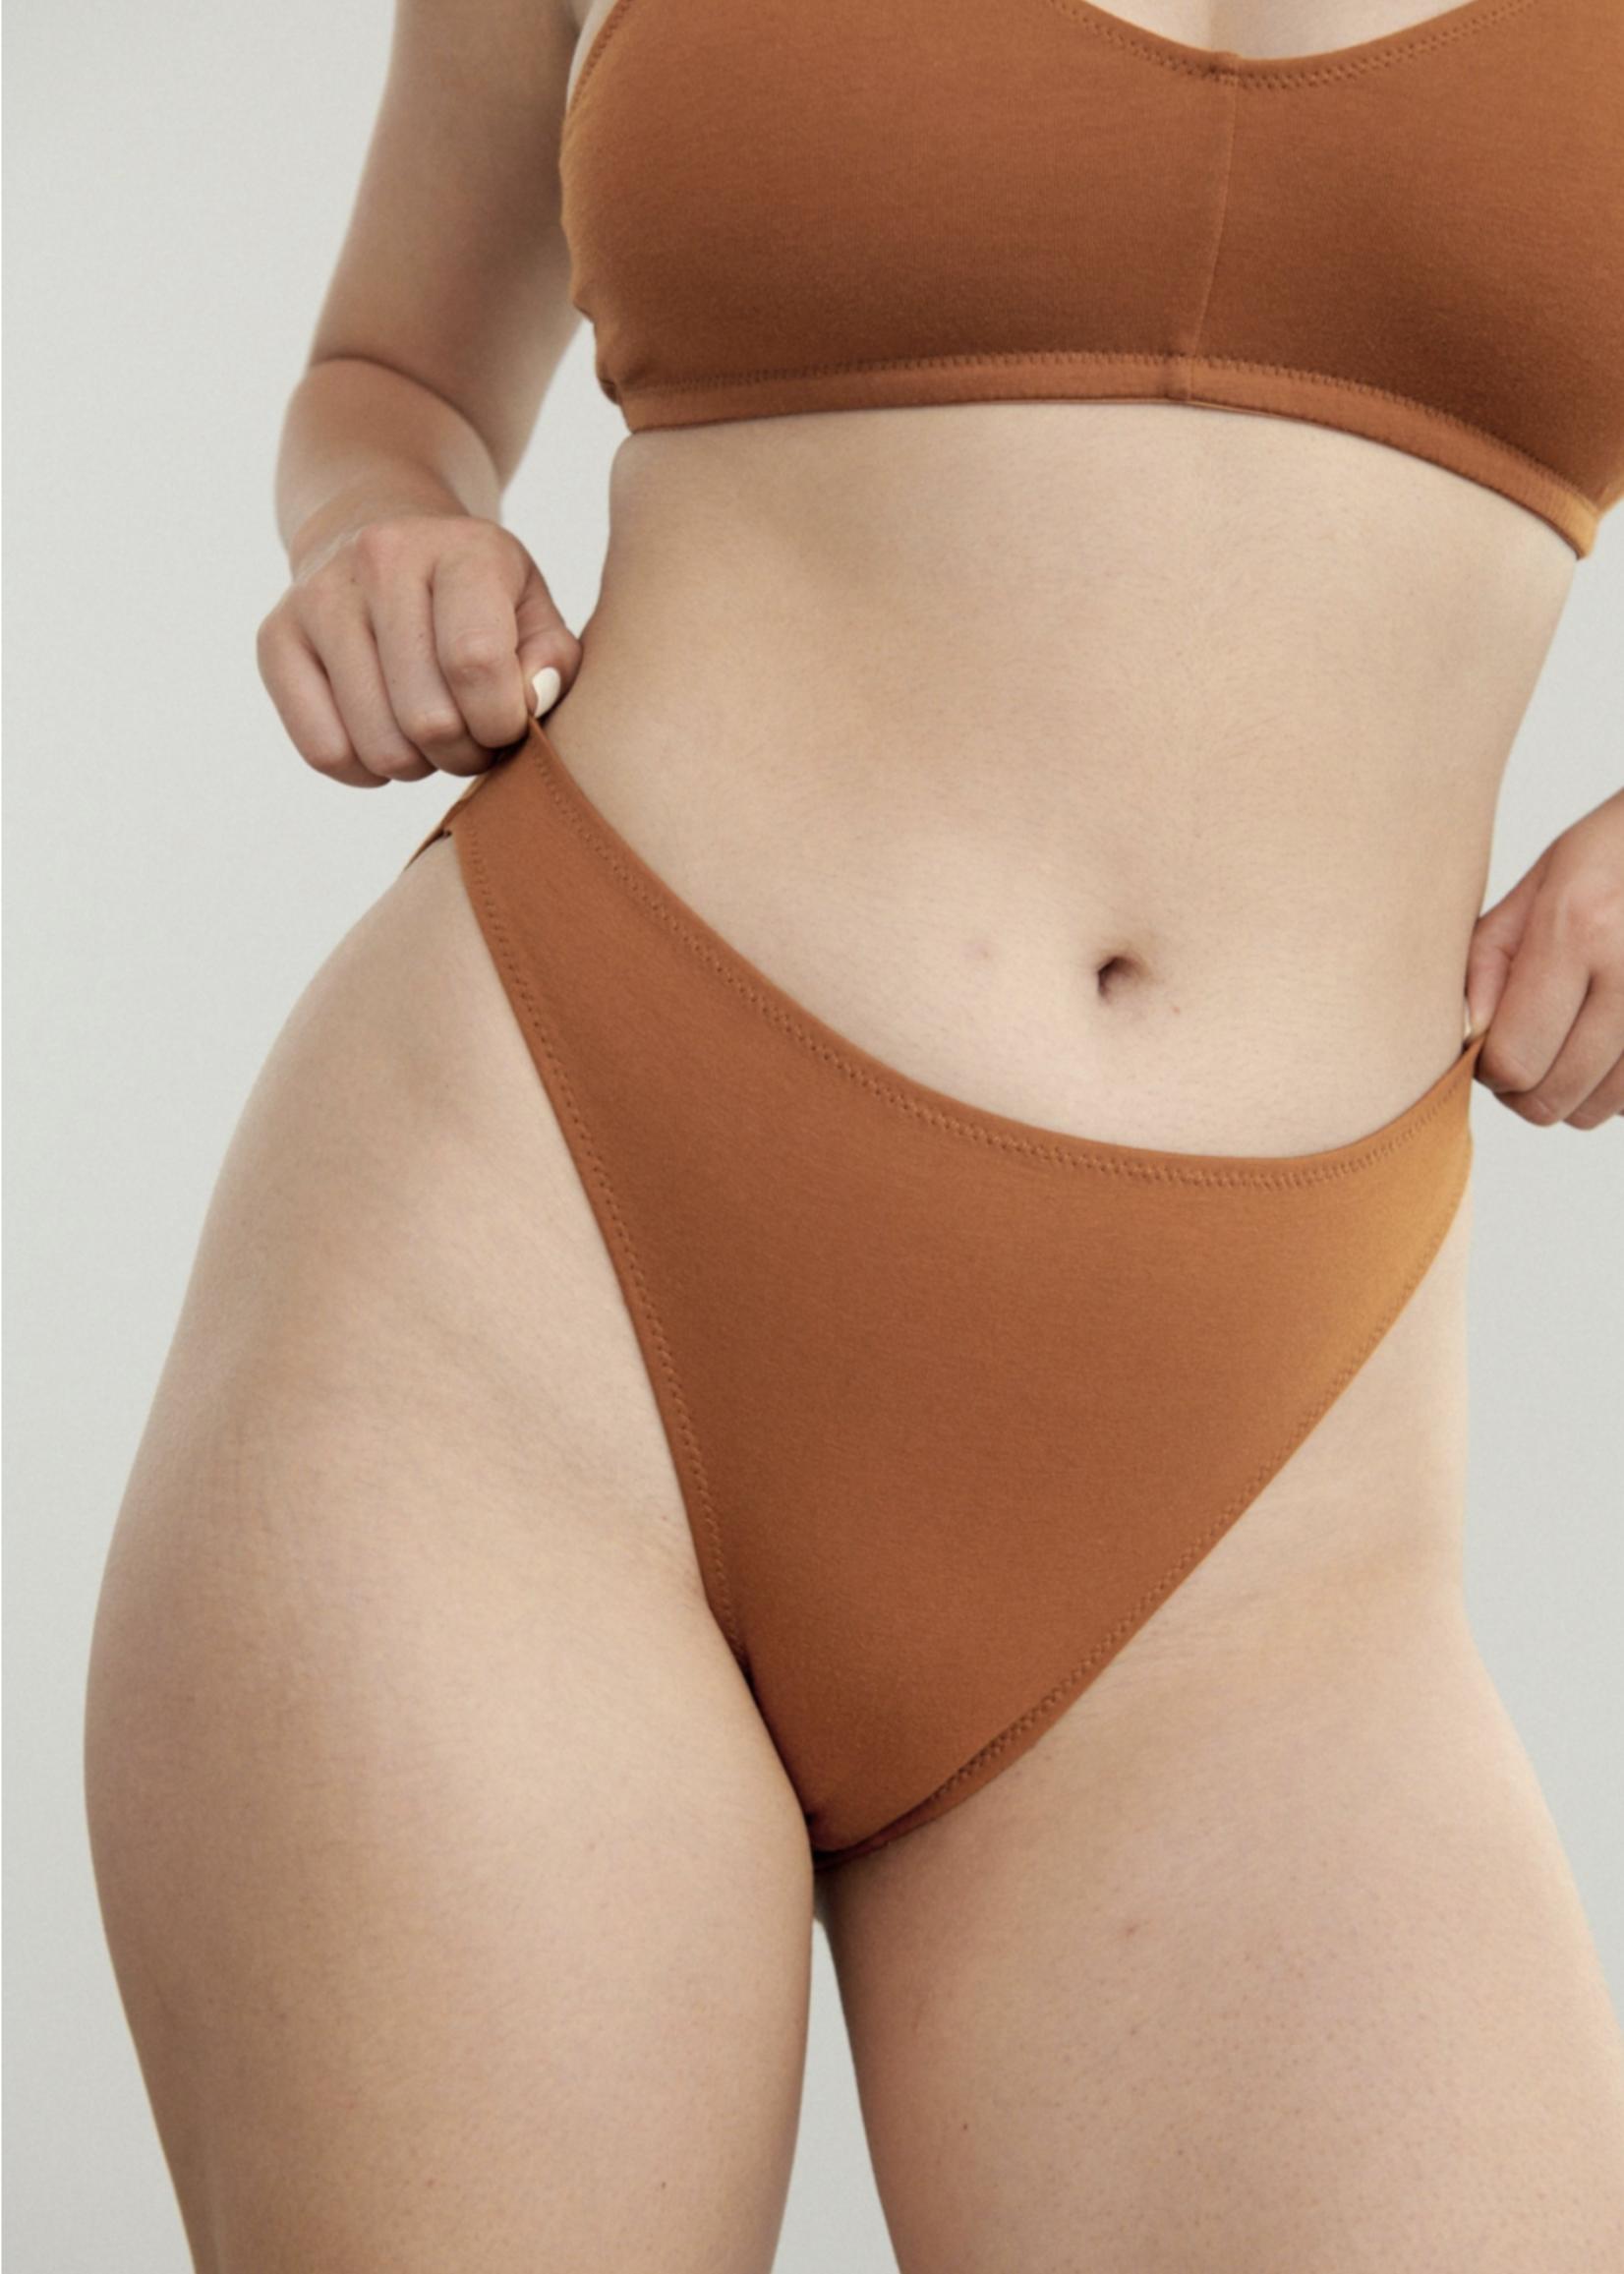 Blush Lingerie Bikini High Leg Underwear